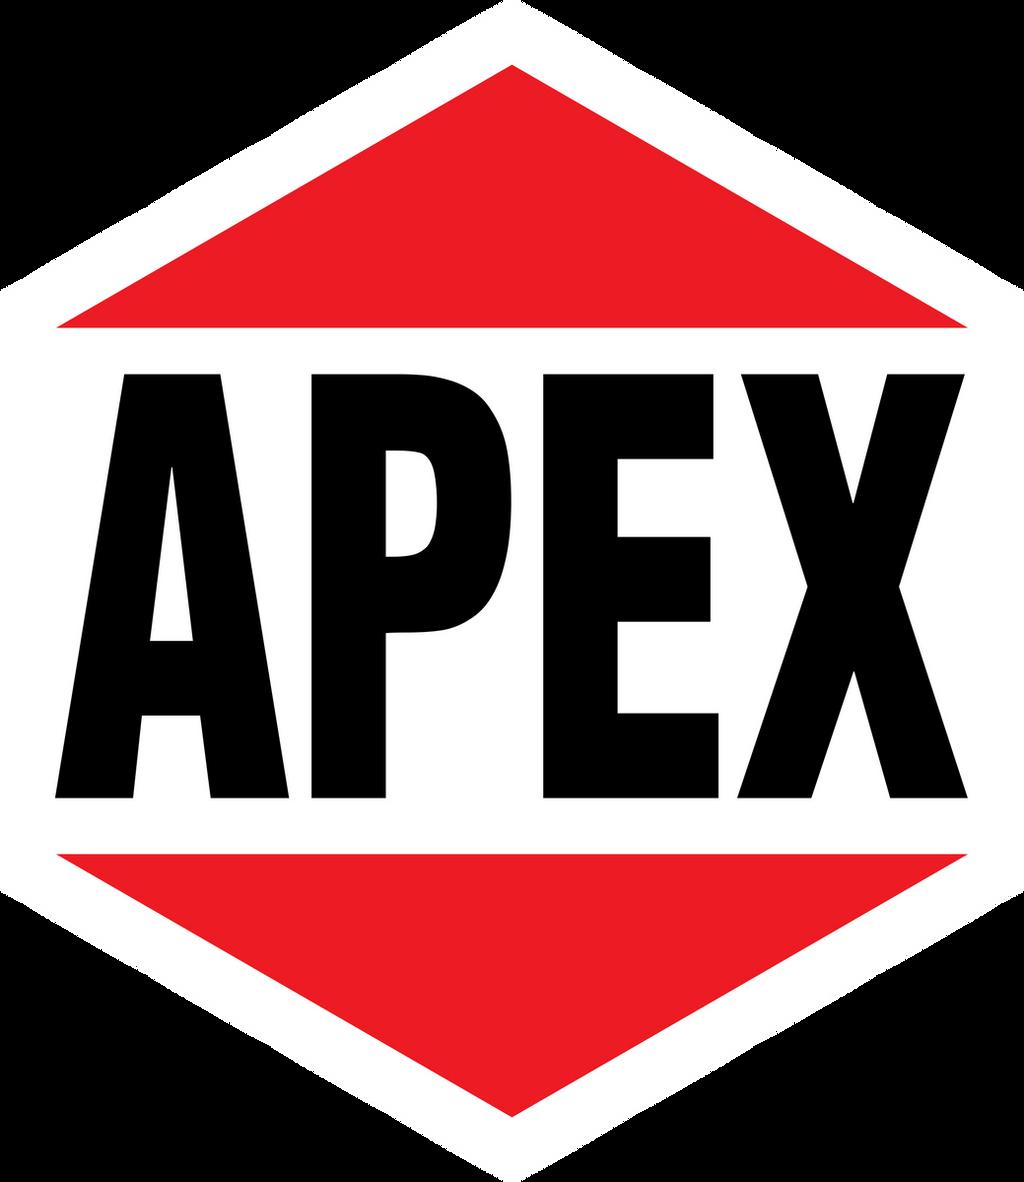 Apex Logo By Monkyboy Gbr by MonkyboyGBR on DeviantArt